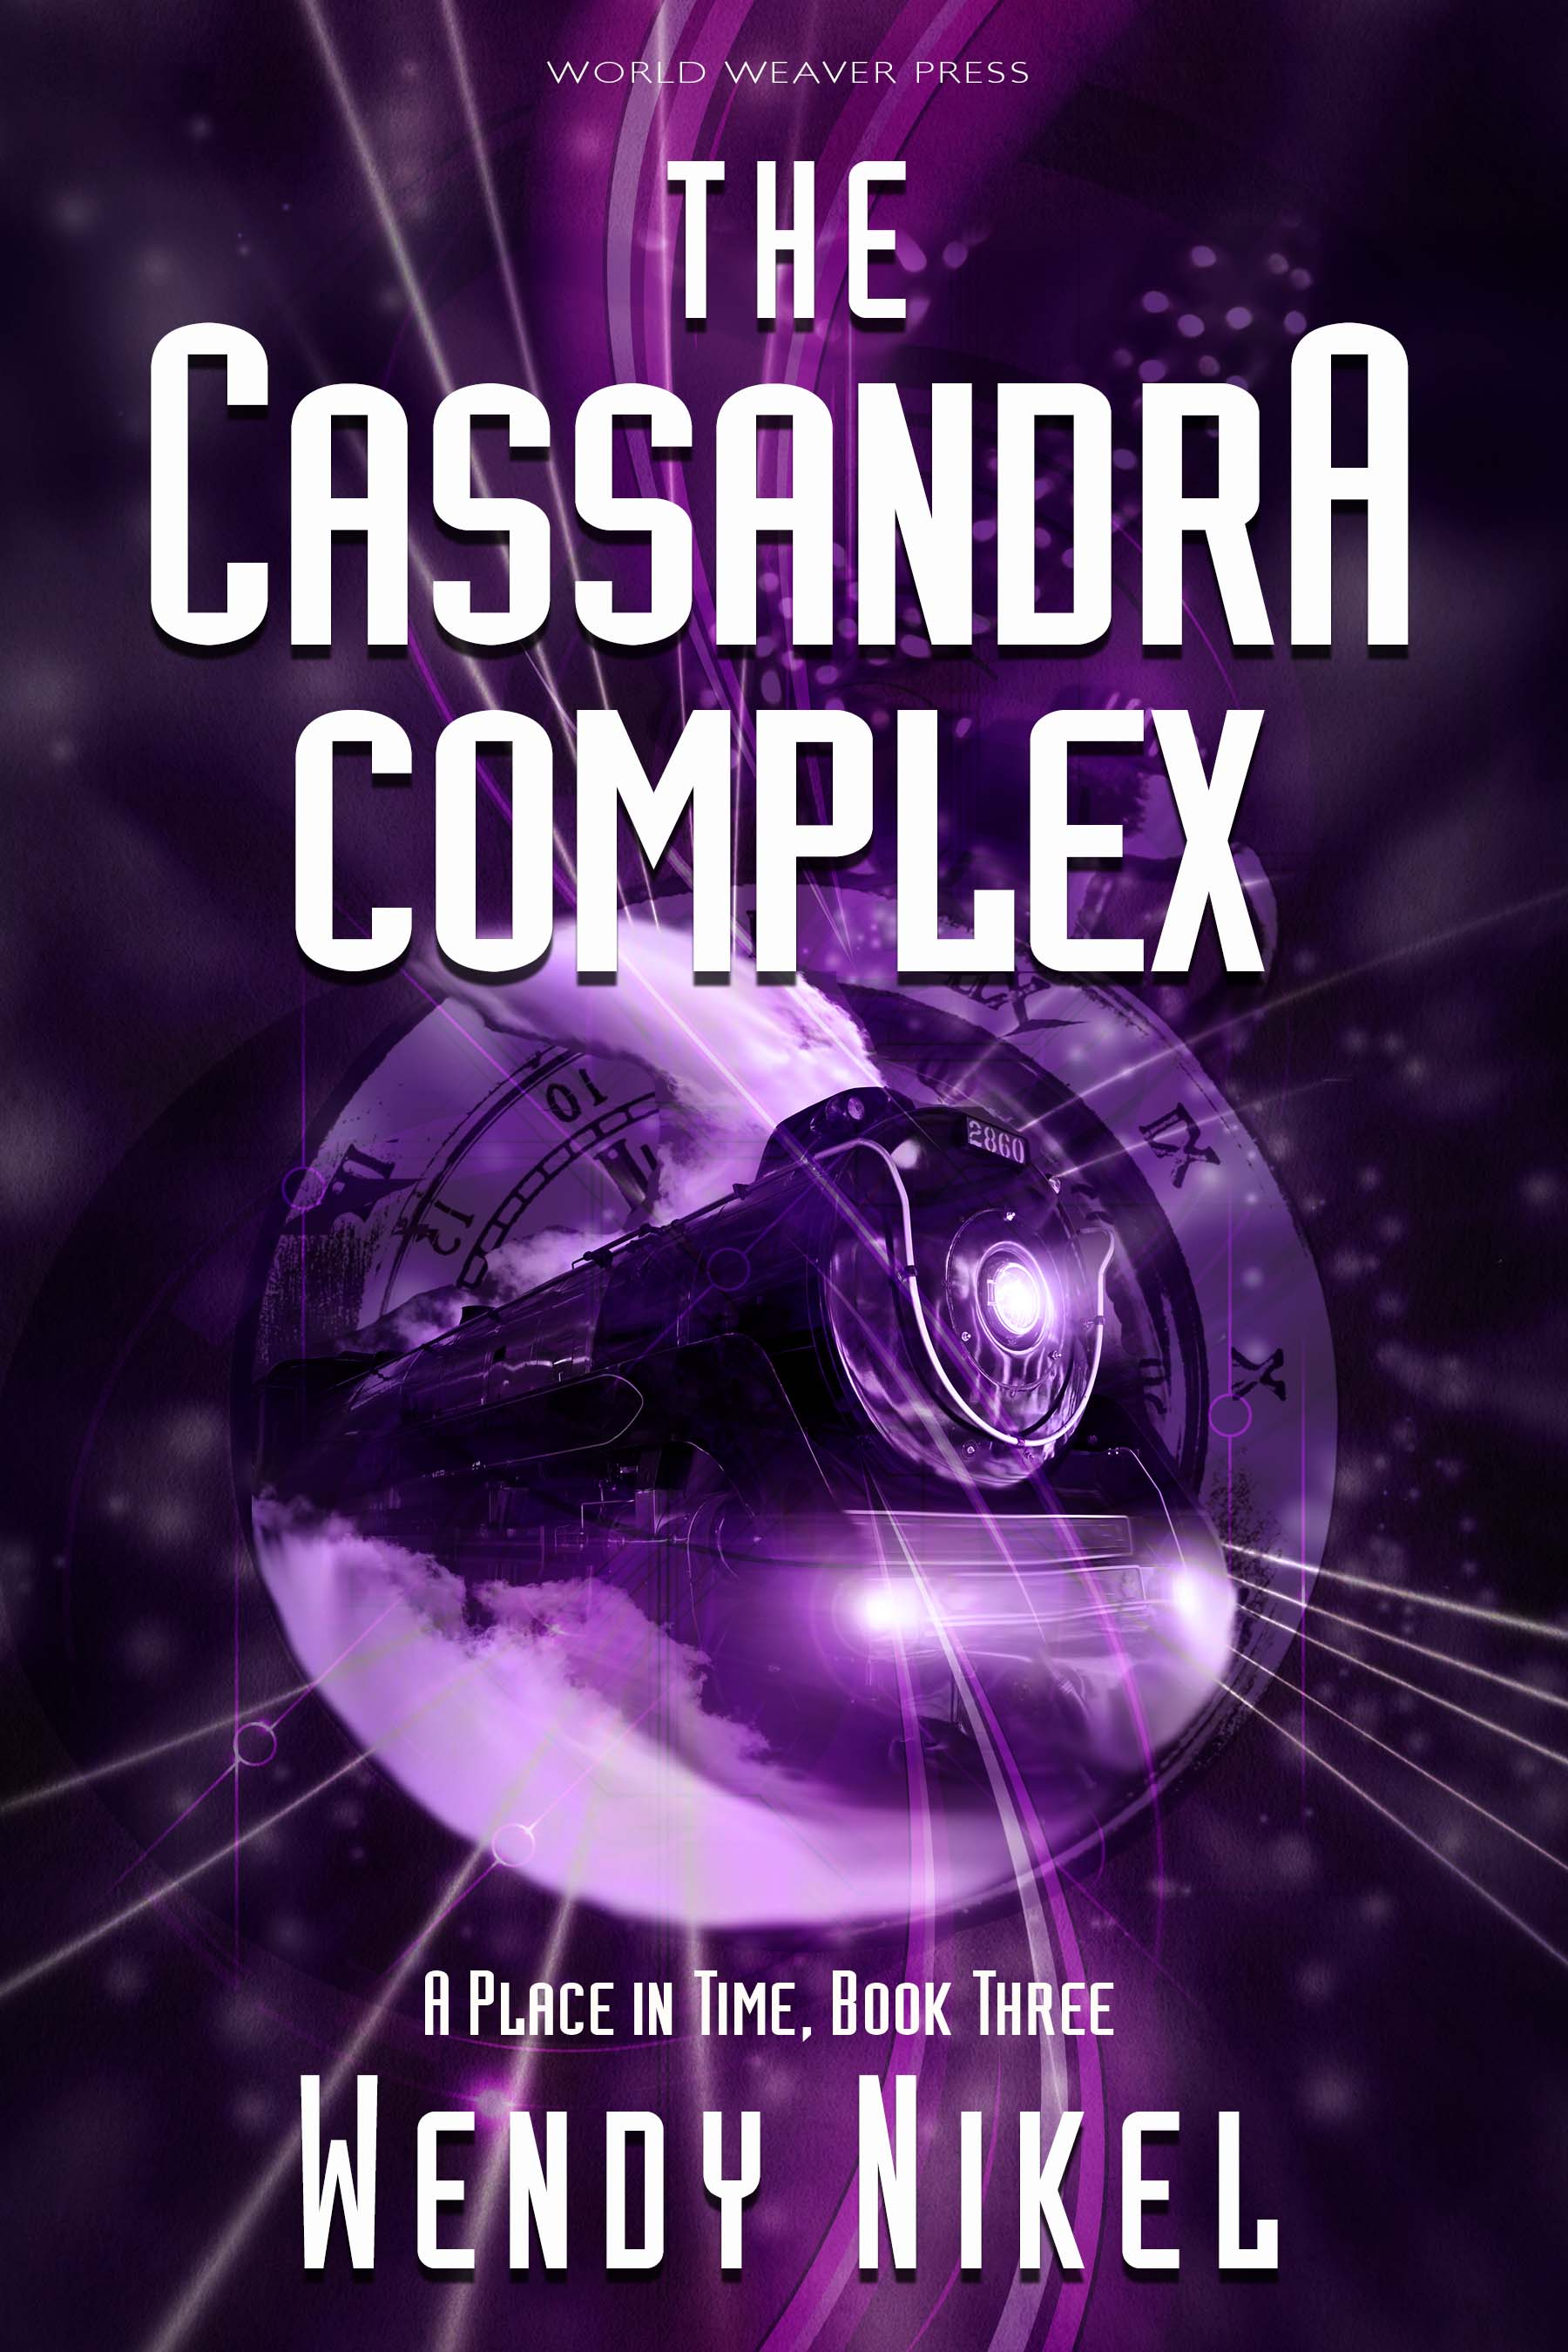 Cassandra Complex Cover Image